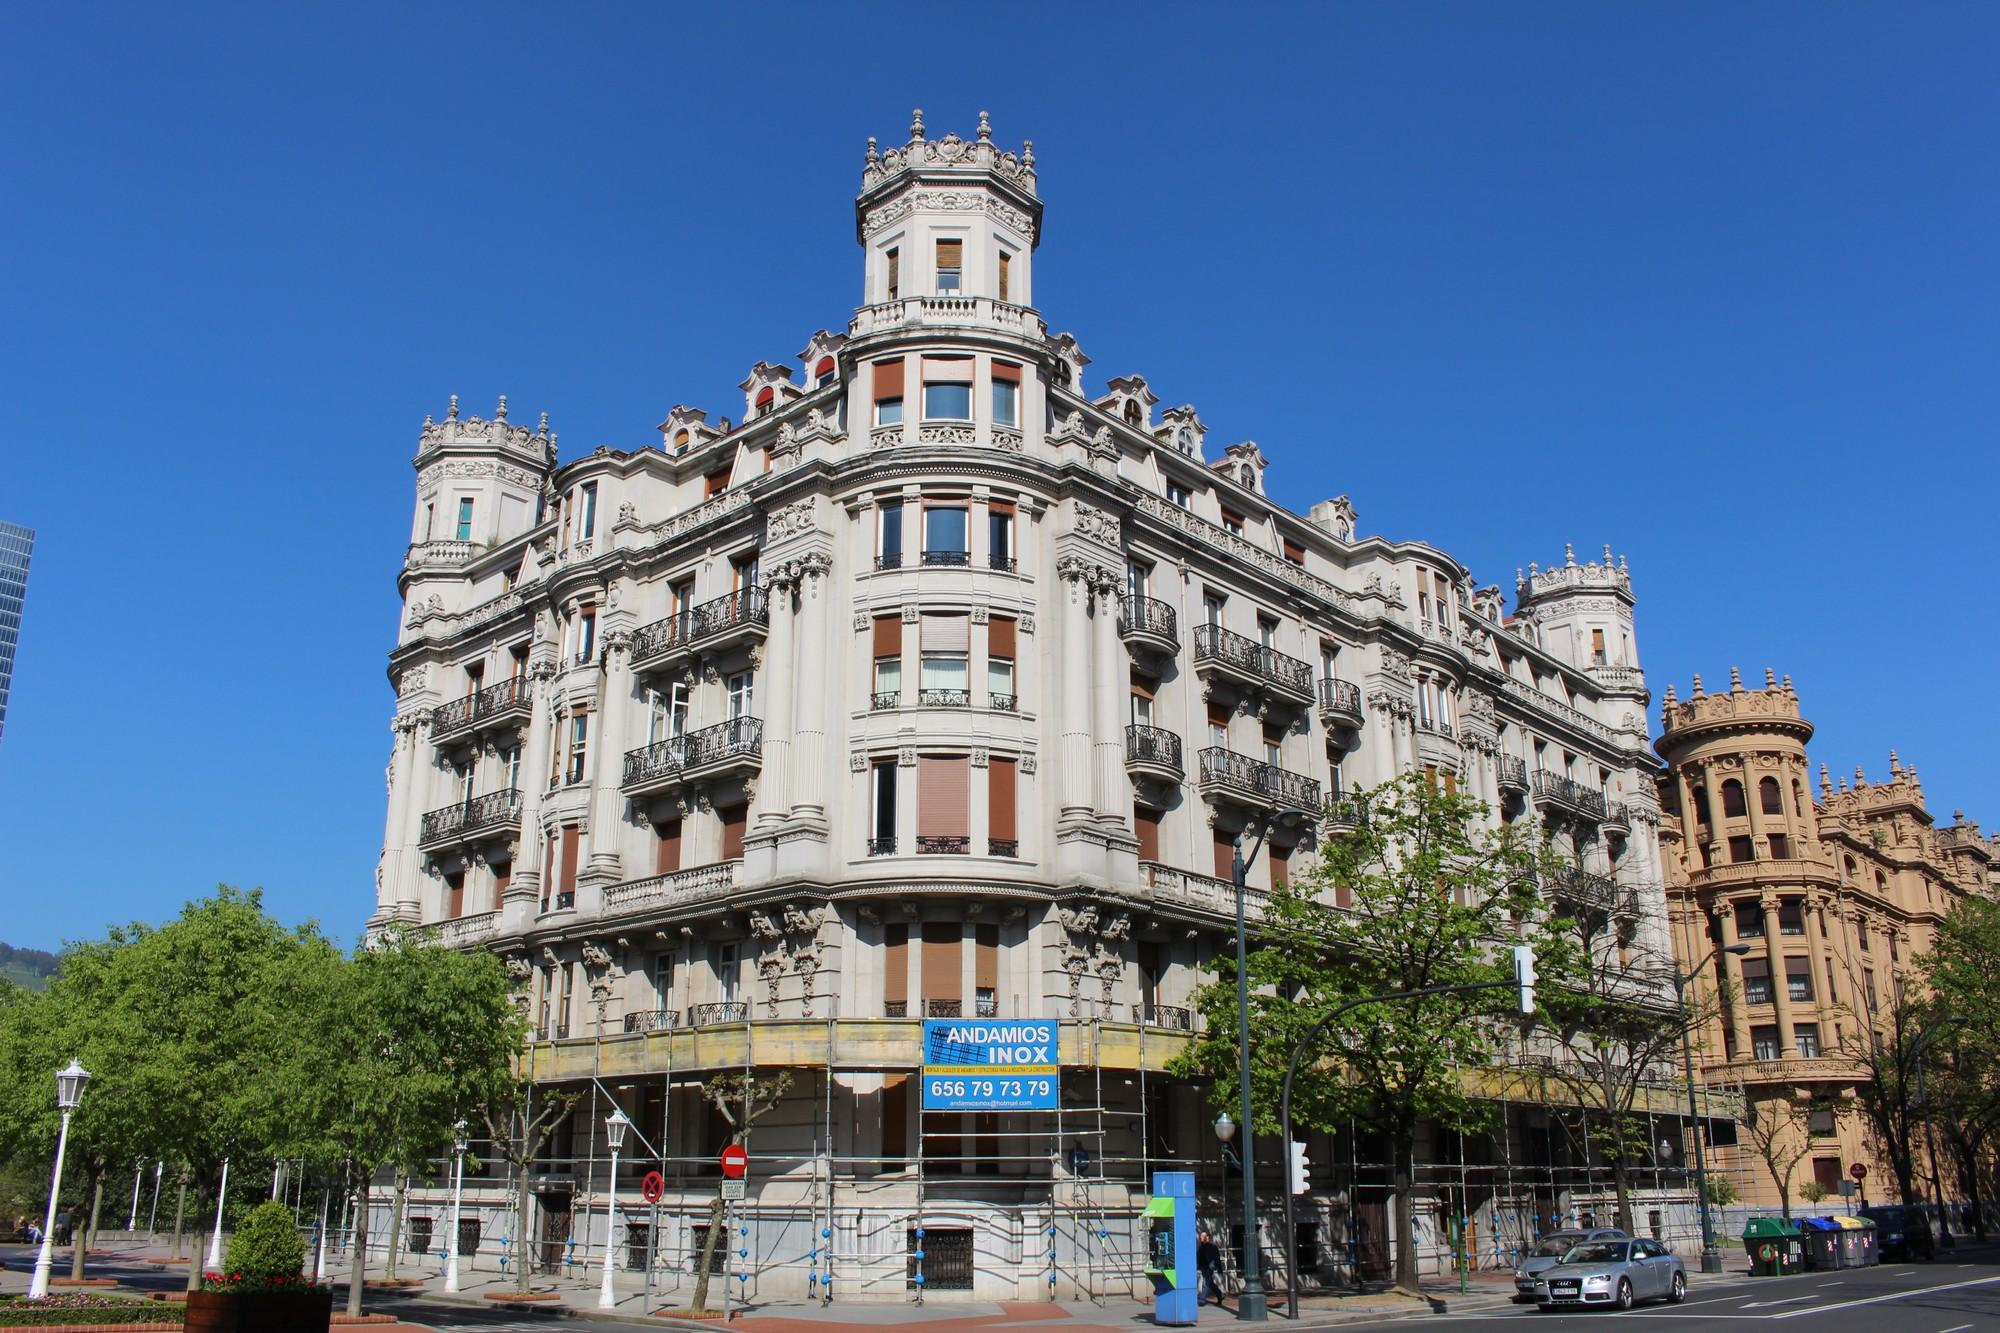 El Ensanche, Bilbao